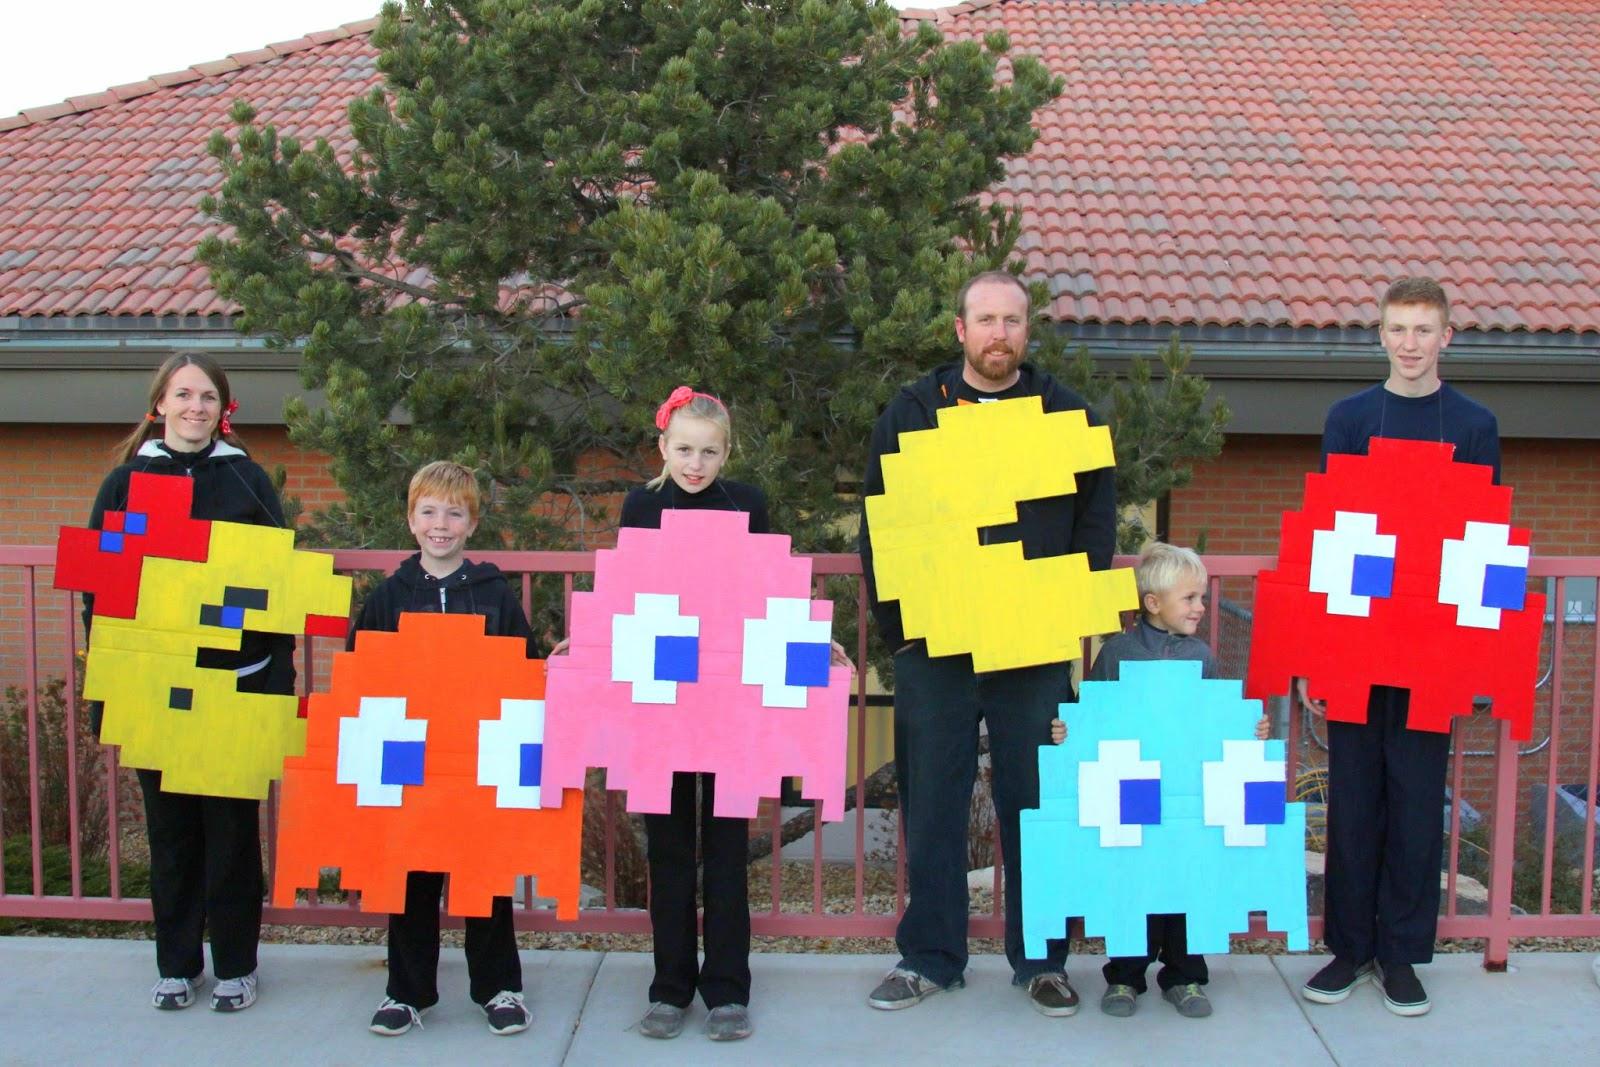 sc 1 st  Liu0027l Bucku0027s Creations & Liu0027l Bucku0027s Creations: Homemade Pac-Man Halloween Costumes